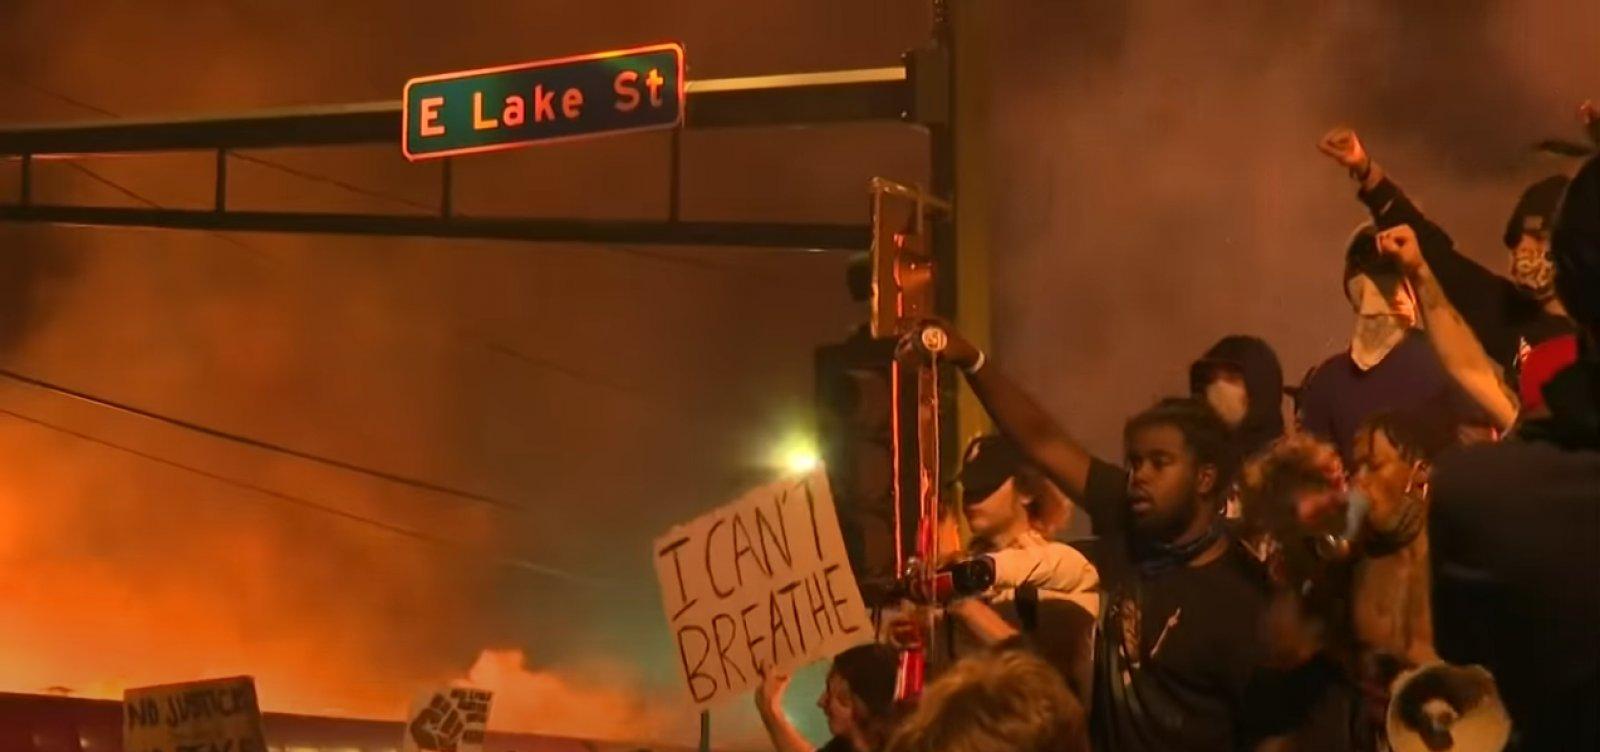 [Protestos contra racismo chegam ao 5º dia nos Estados Unidos]